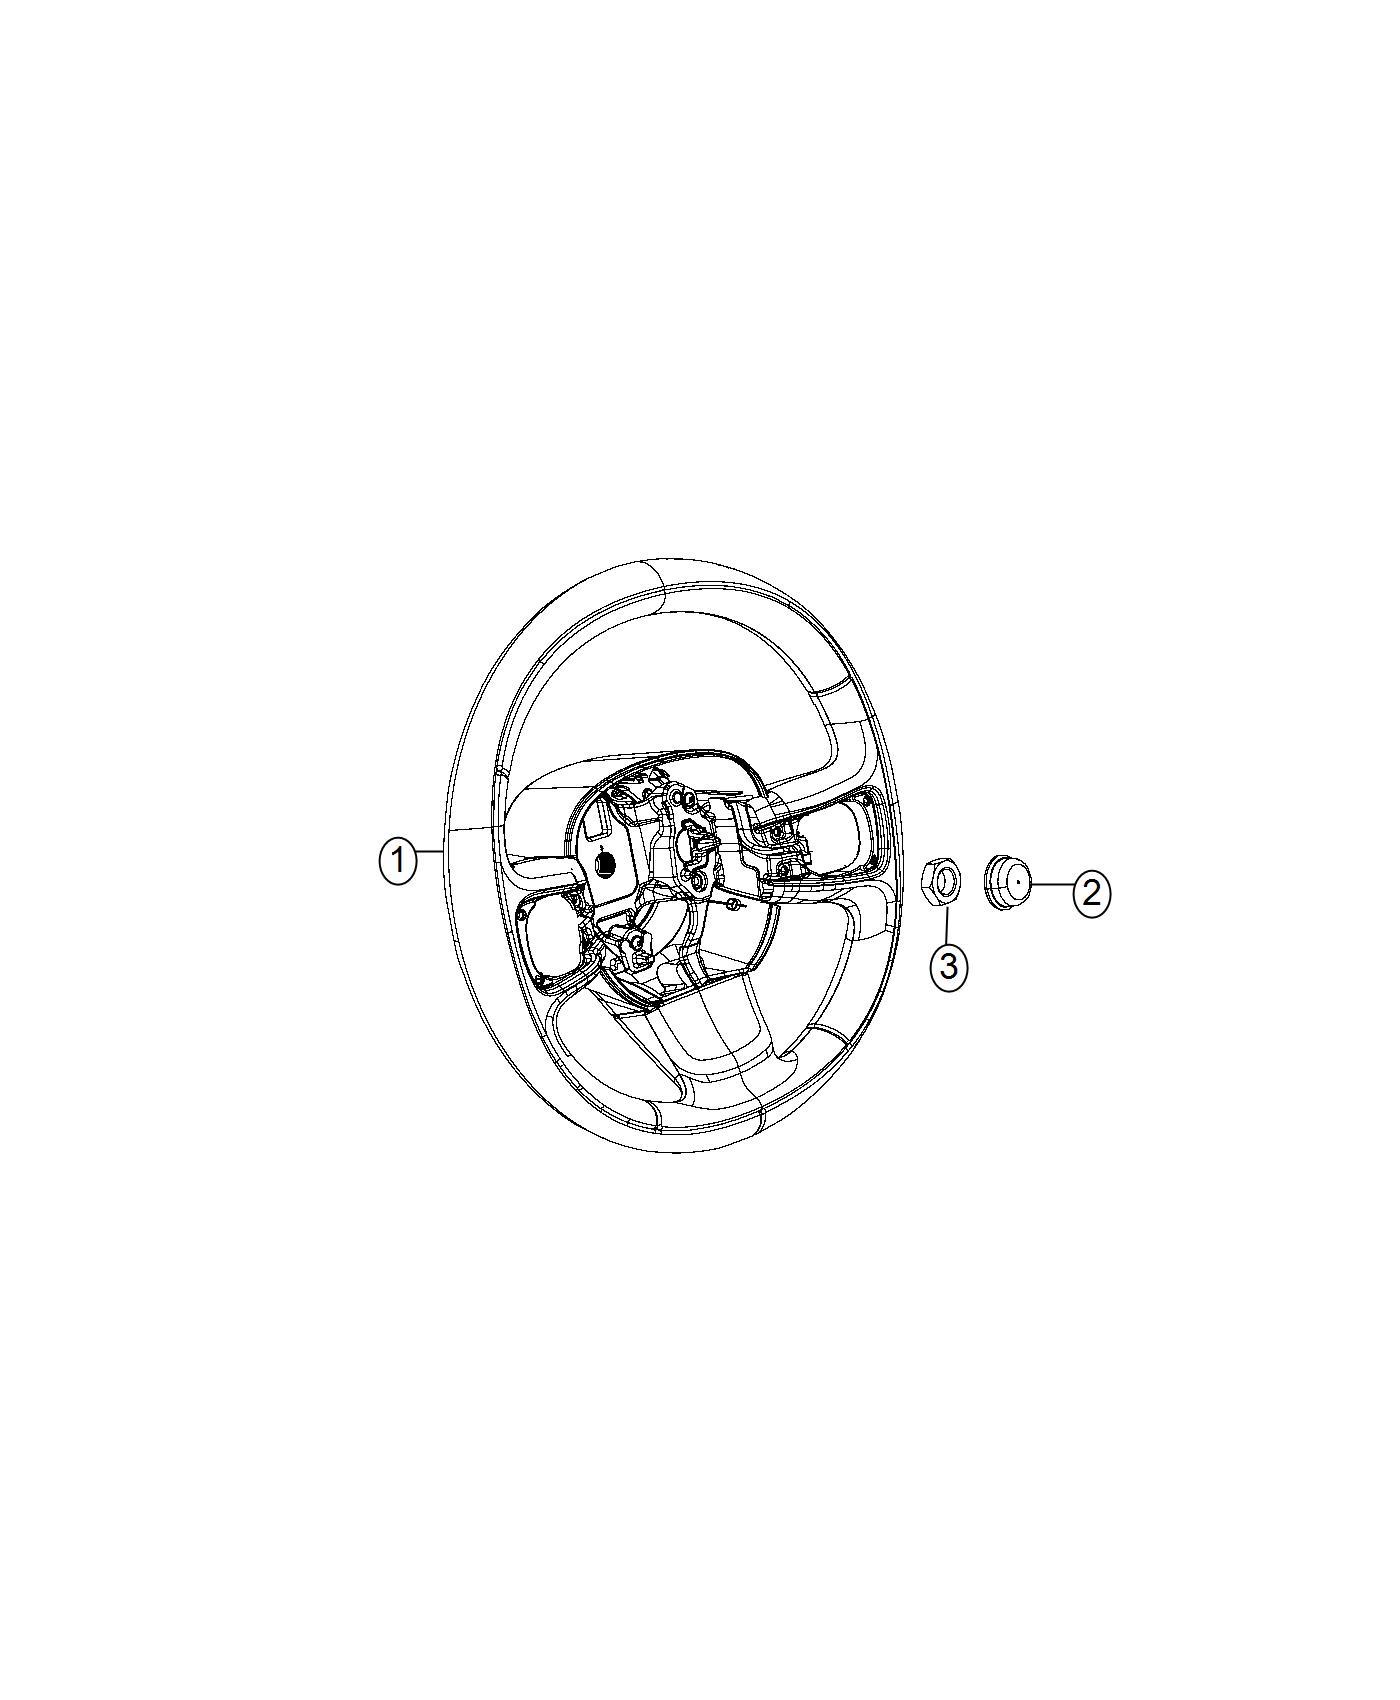 Ram Promaster City Wagon Nut M16x1 5 Steering